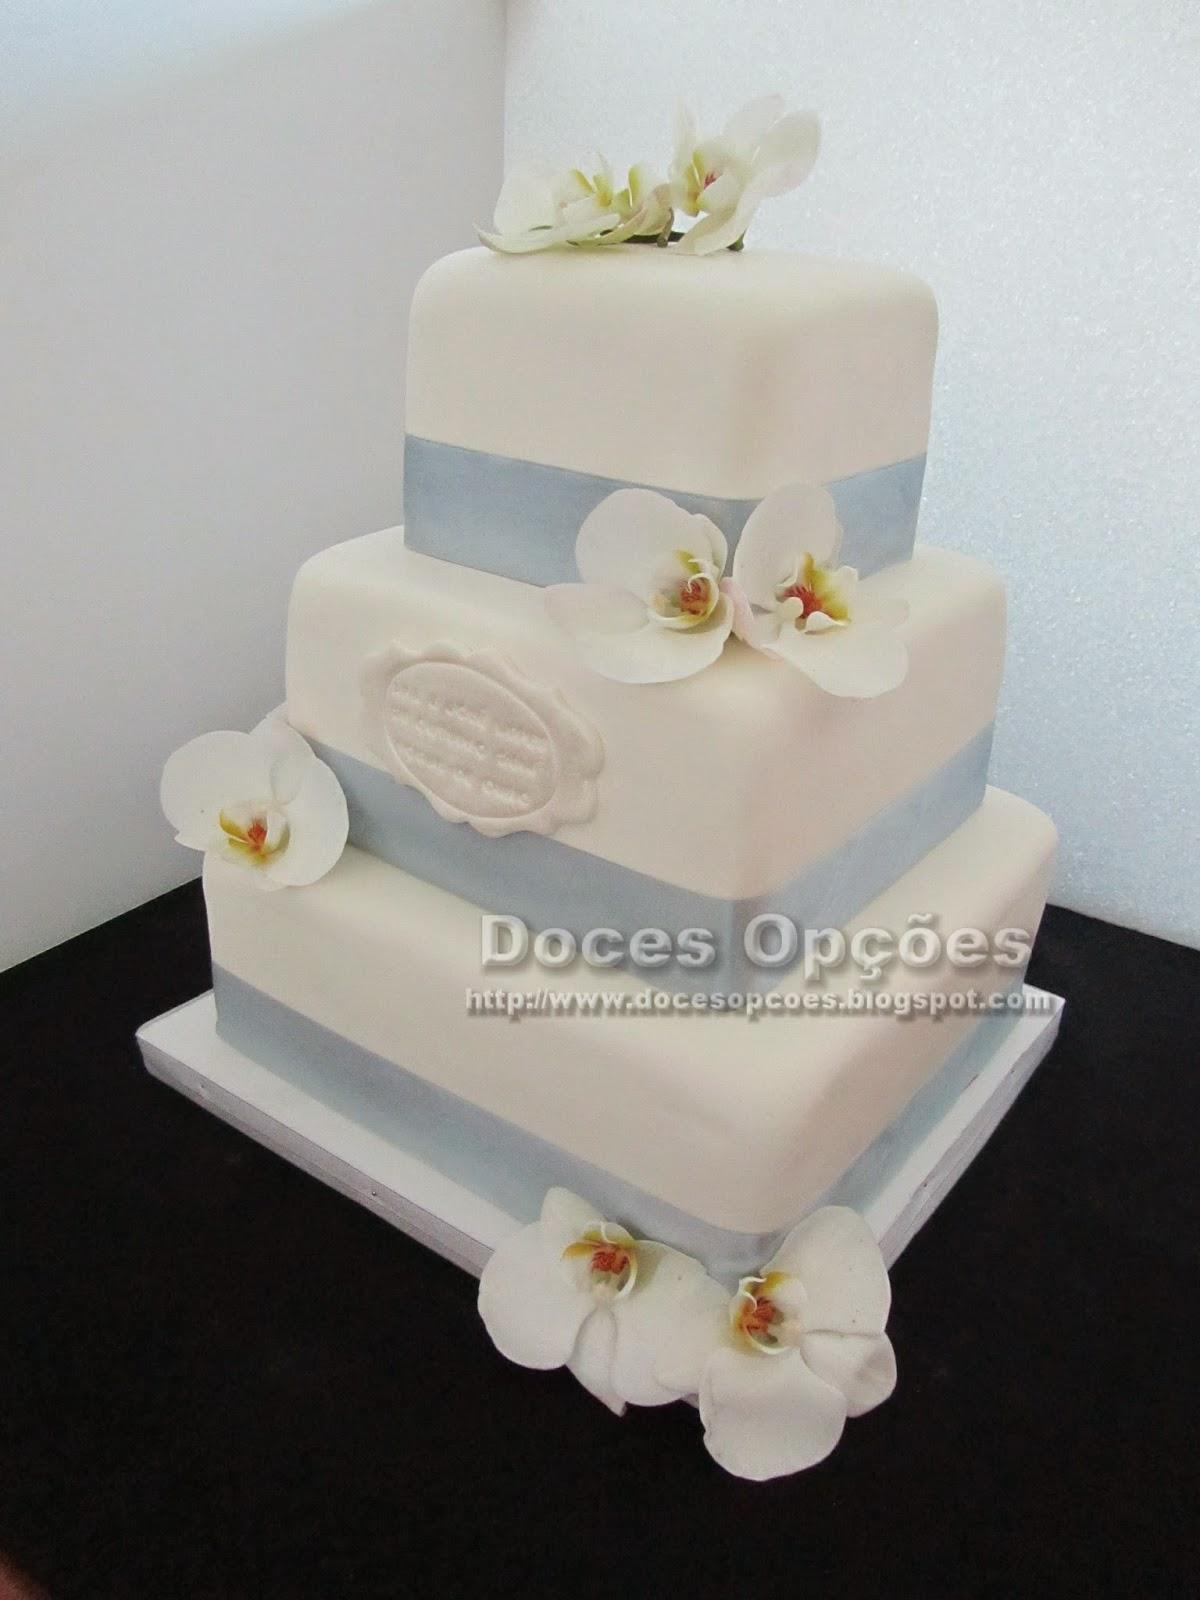 bolo decorado Bodas de Ouro